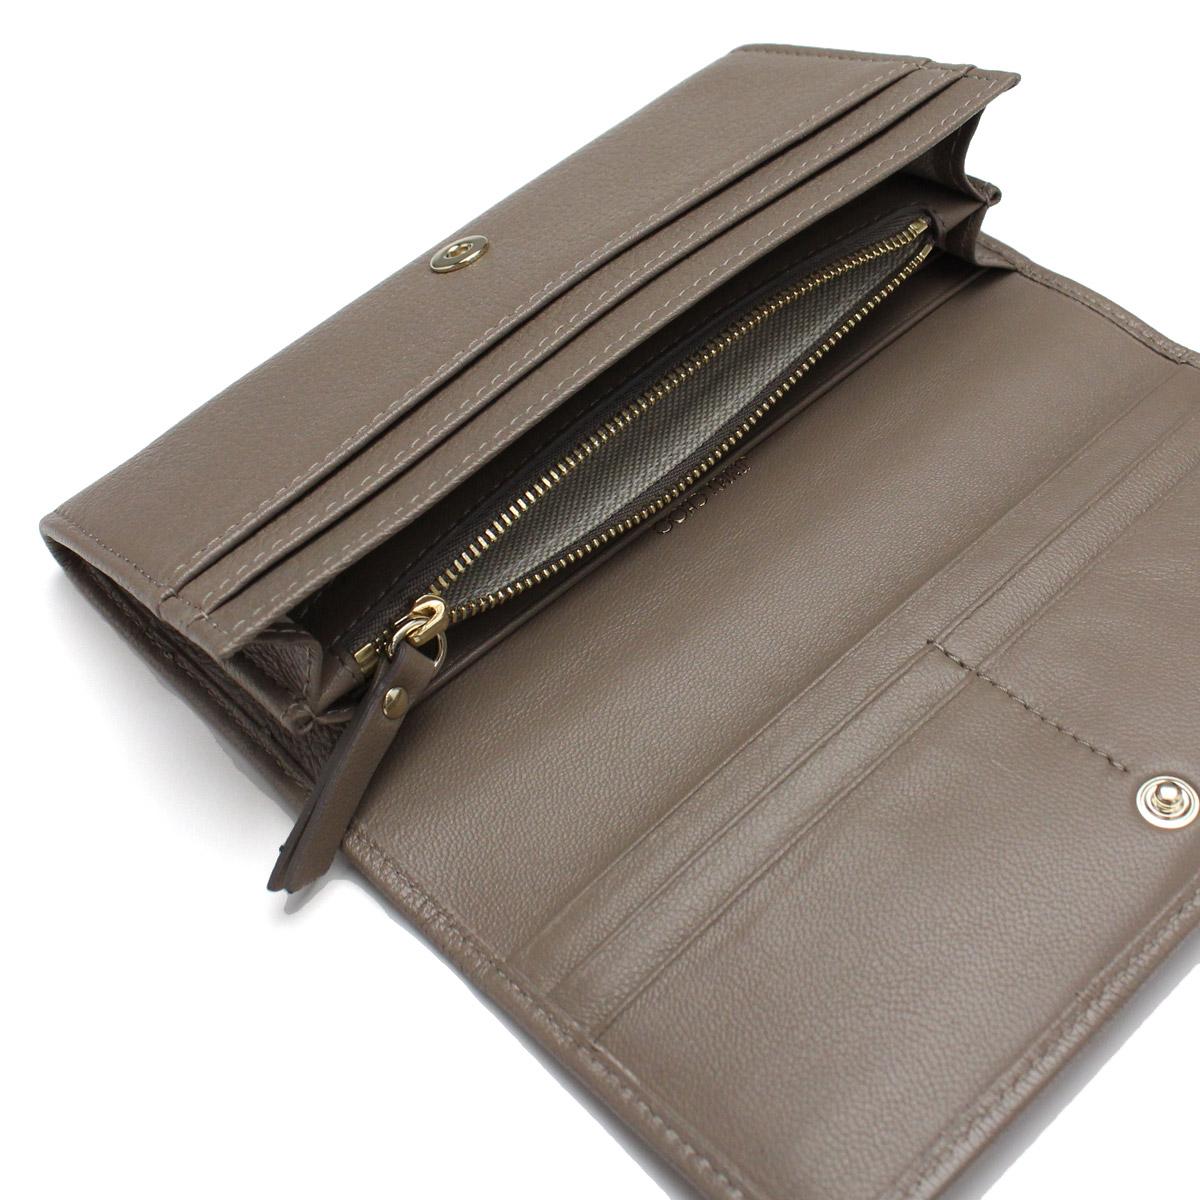 cb1b7a654bb ... Two ジミーチュウ (JIMMY CHOO) Remy fold long wallet REMY GRZ LIGHT MOCHA  brown ...